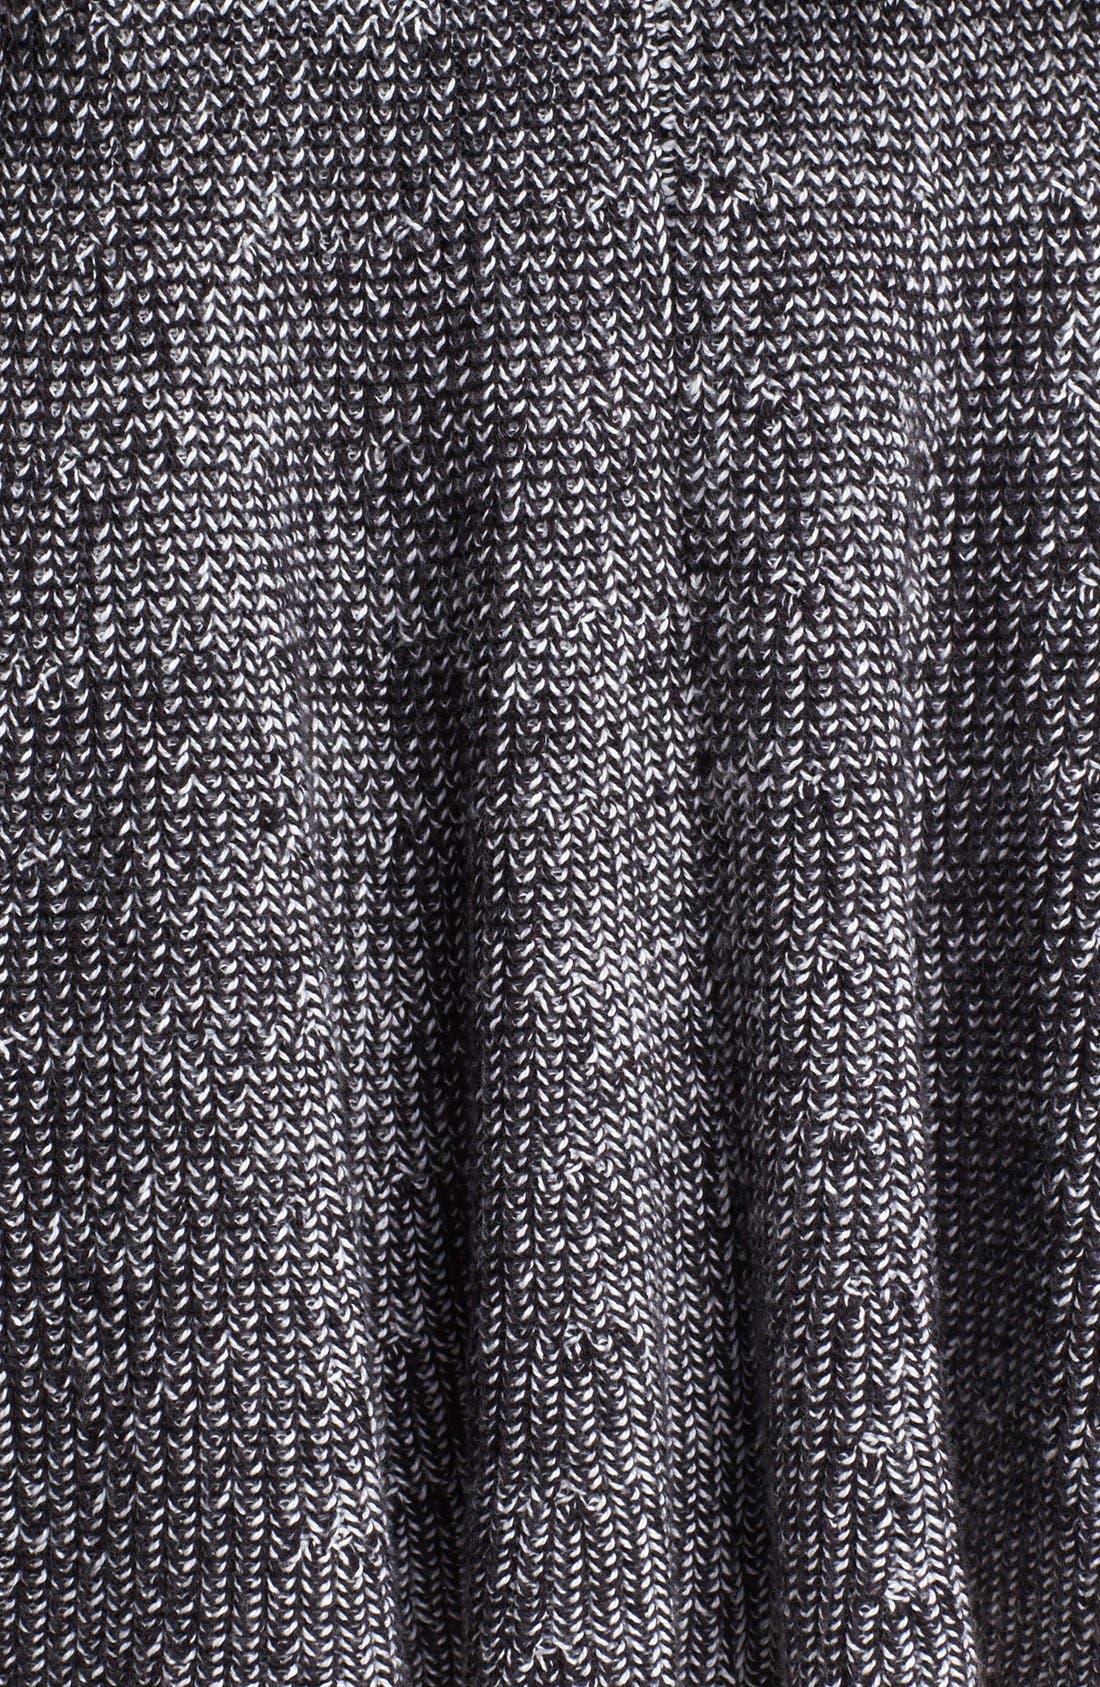 Alternate Image 3  - MARC BY MARC JACOBS 'Jen' Cotton Sweater Skirt